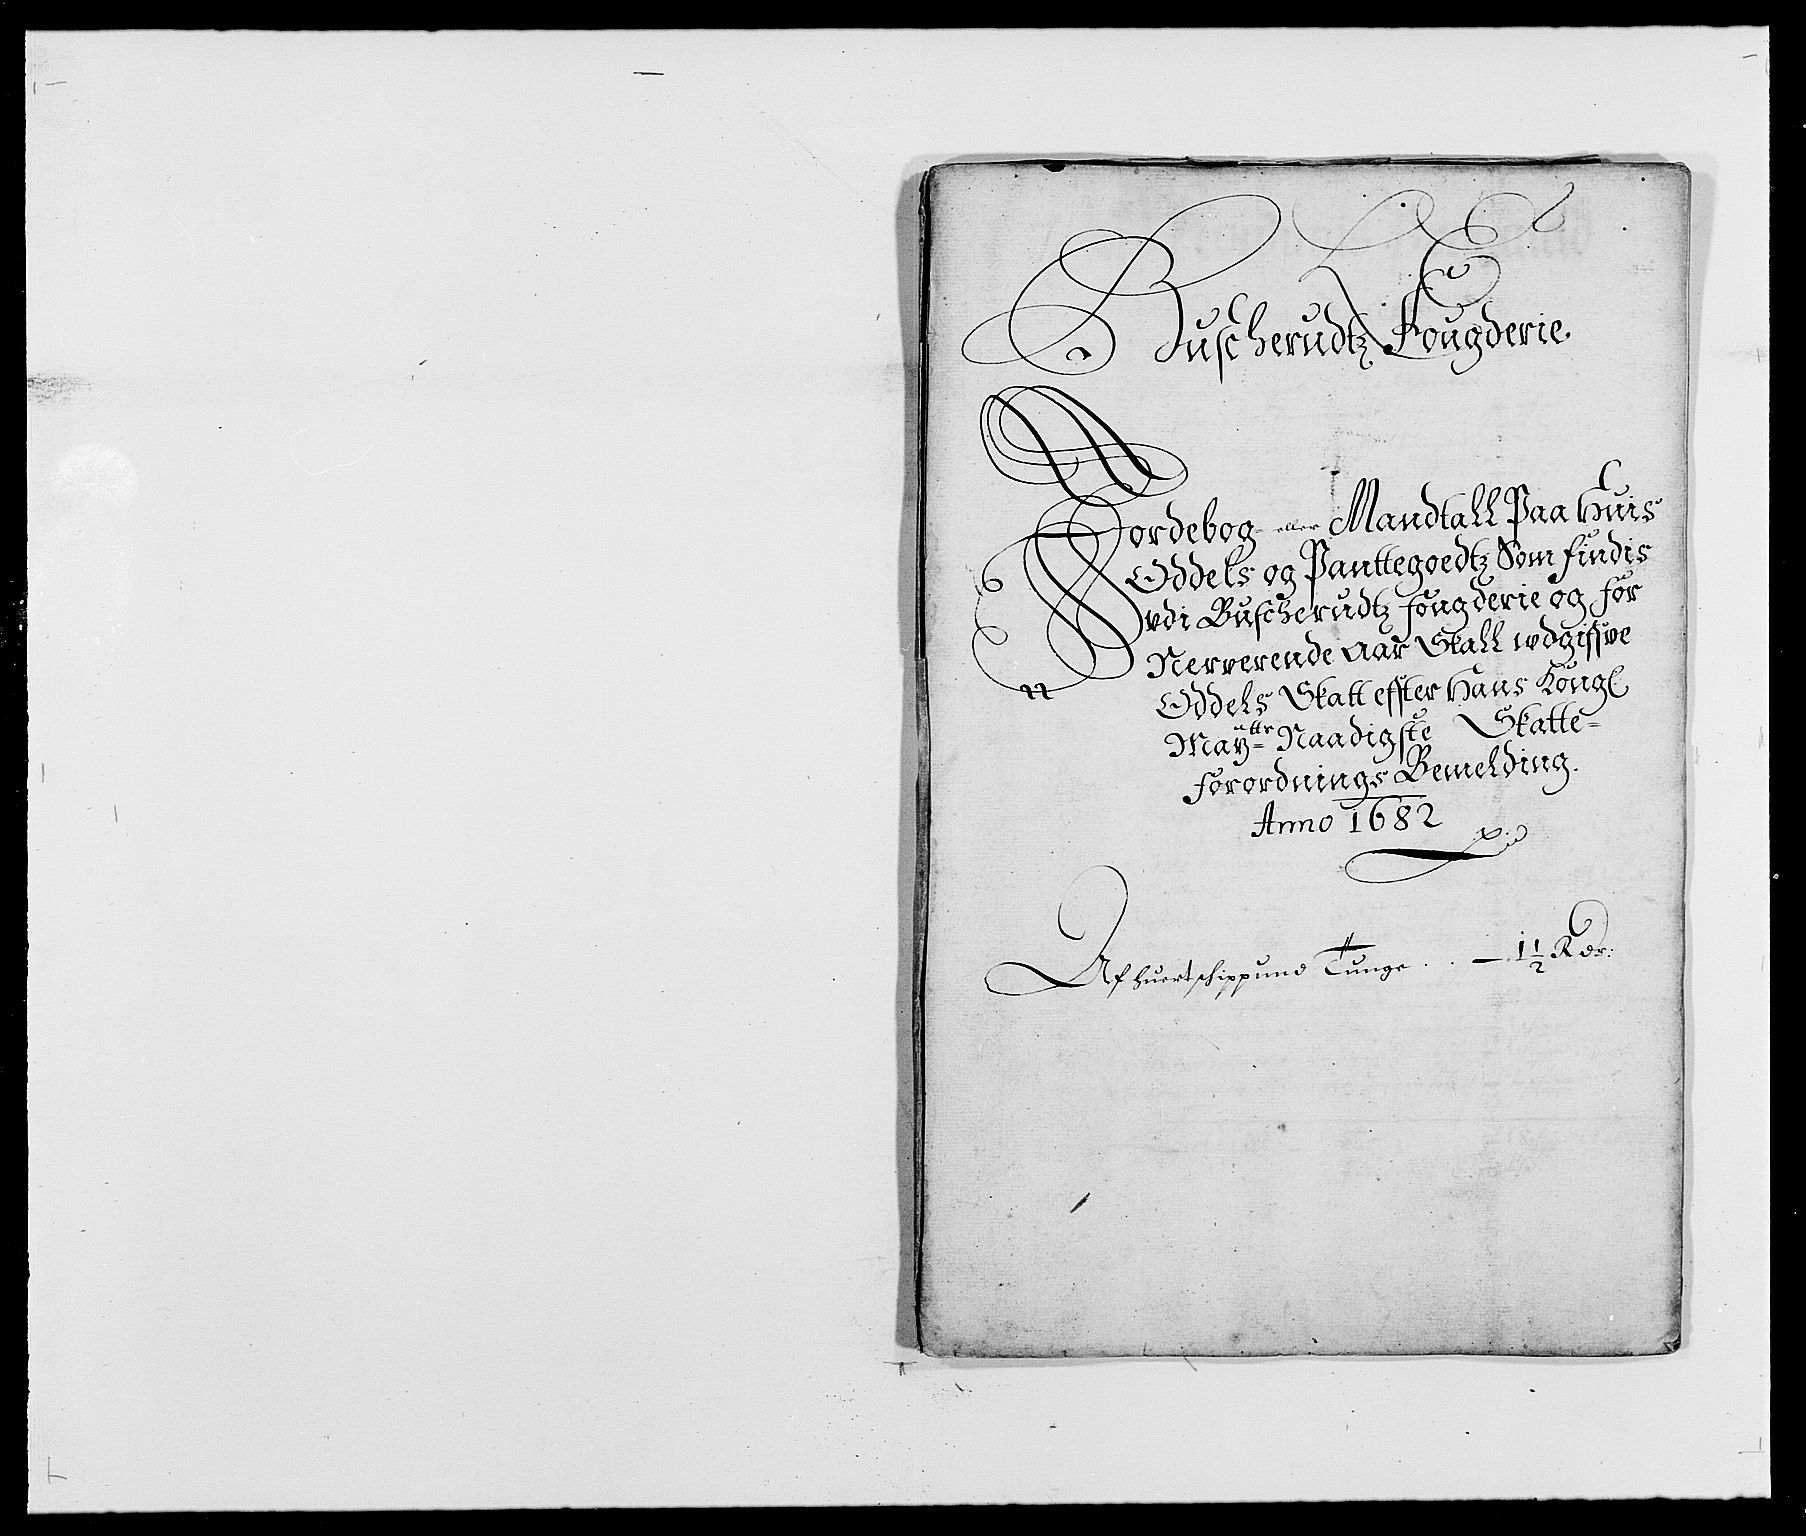 RA, Rentekammeret inntil 1814, Reviderte regnskaper, Fogderegnskap, R25/L1676: Fogderegnskap Buskerud, 1682, s. 85